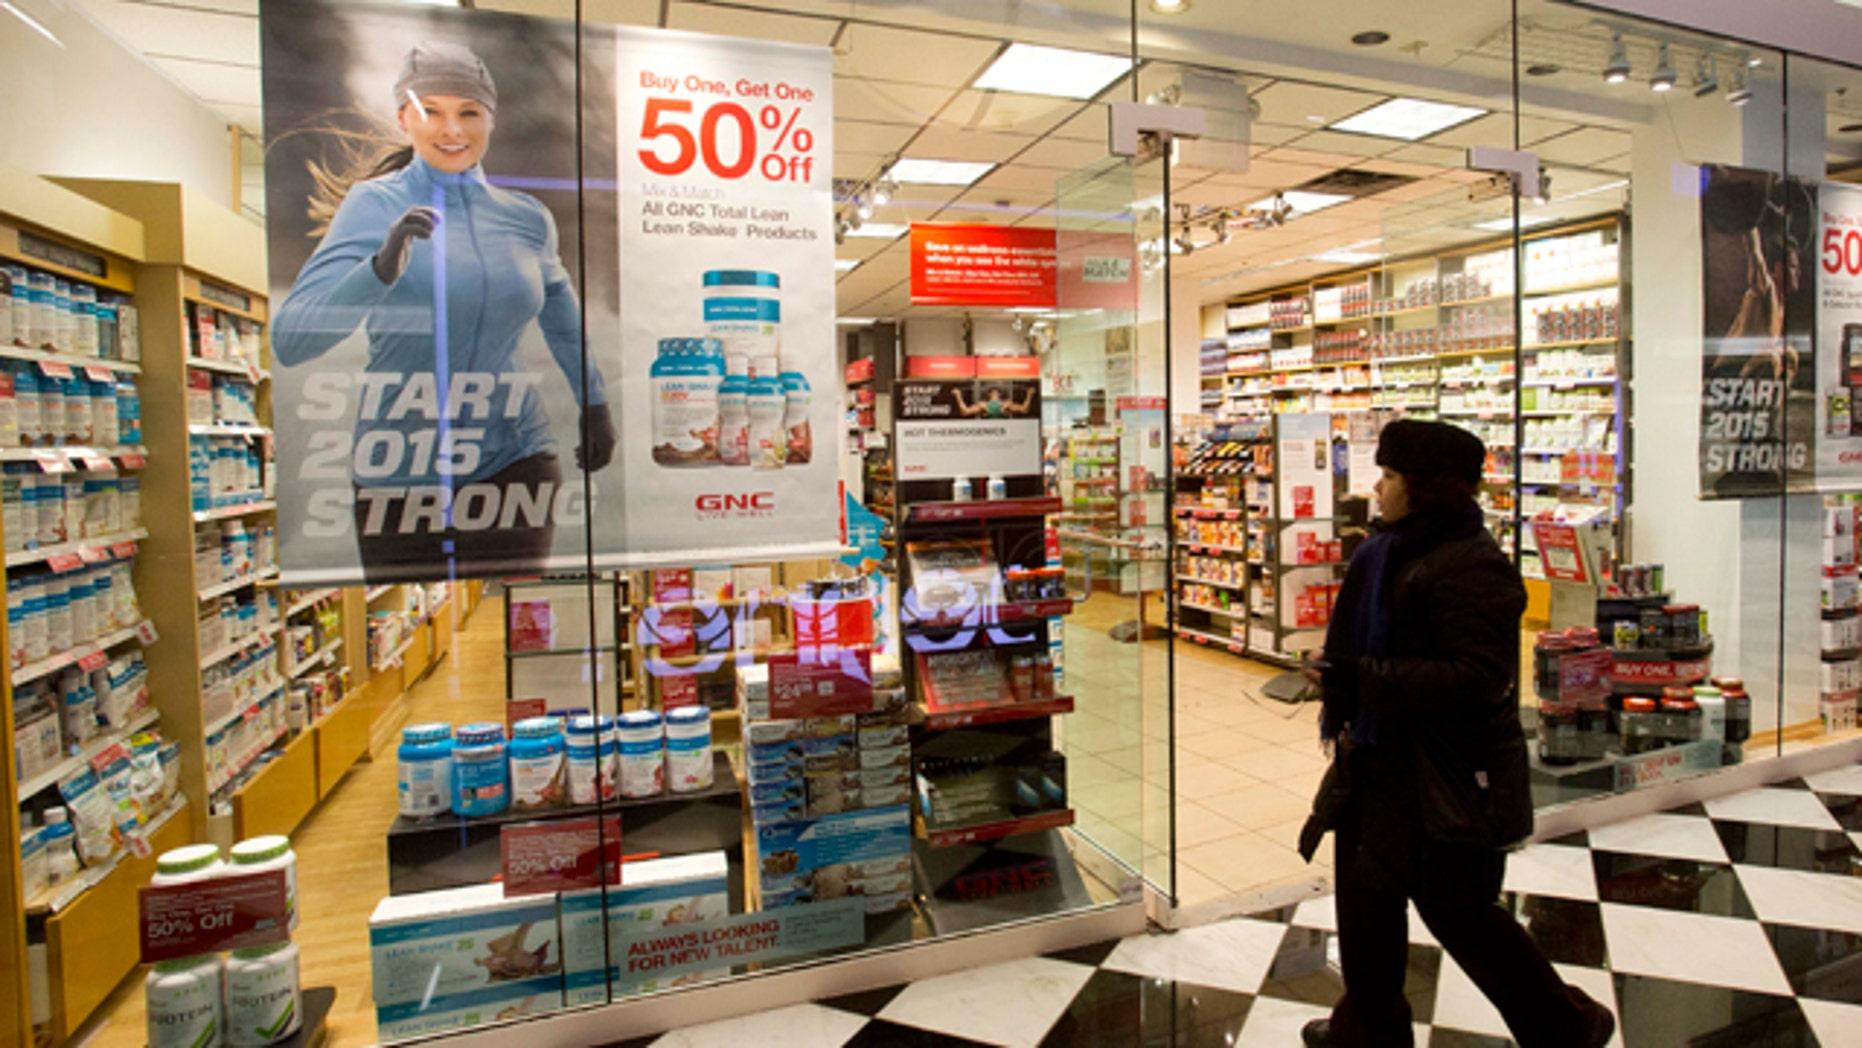 Feb. 3, 2015: A woman walks past a GNC store in New York. (AP Photo/Mark Lennihan)